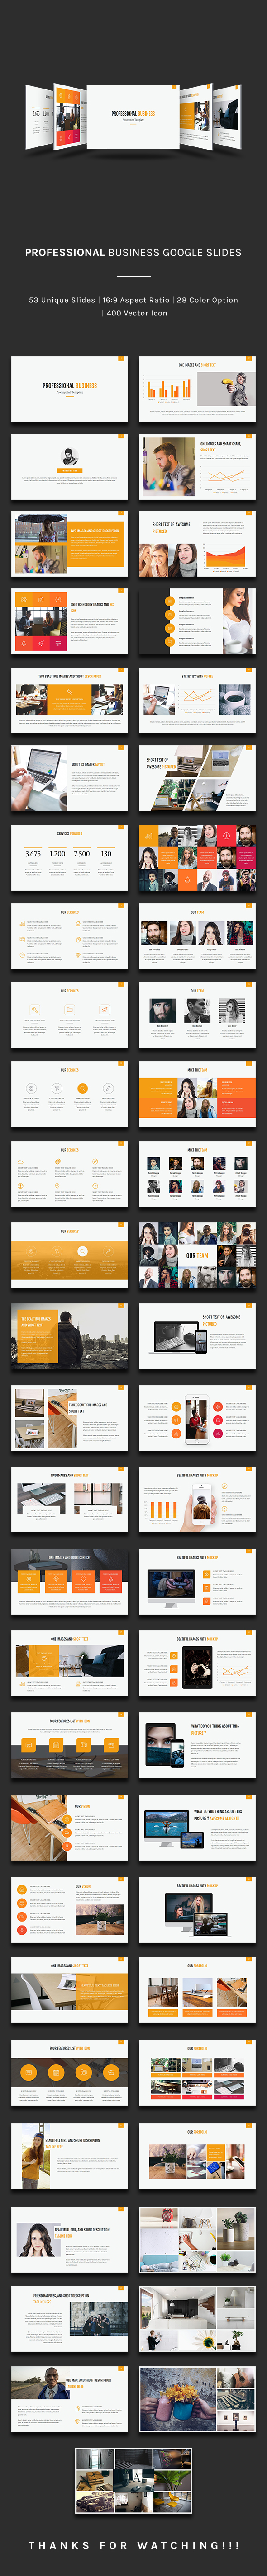 GraphicRiver Professional Business Google Slides 21077086